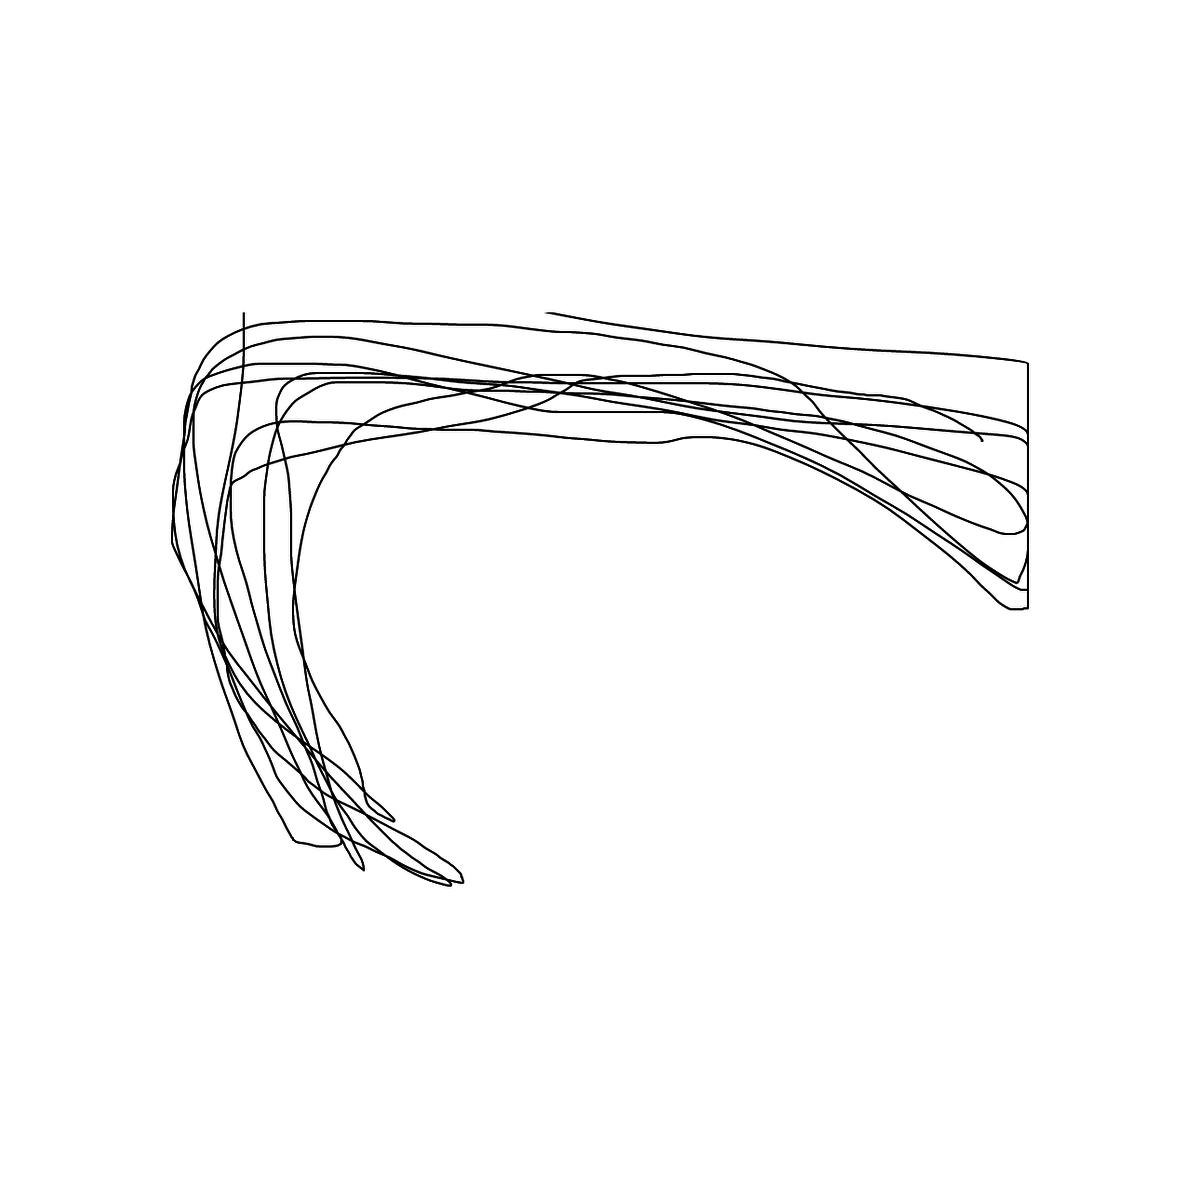 BAAAM drawing#20558 lat:40.7116241455078100lng: -74.0091781616211000